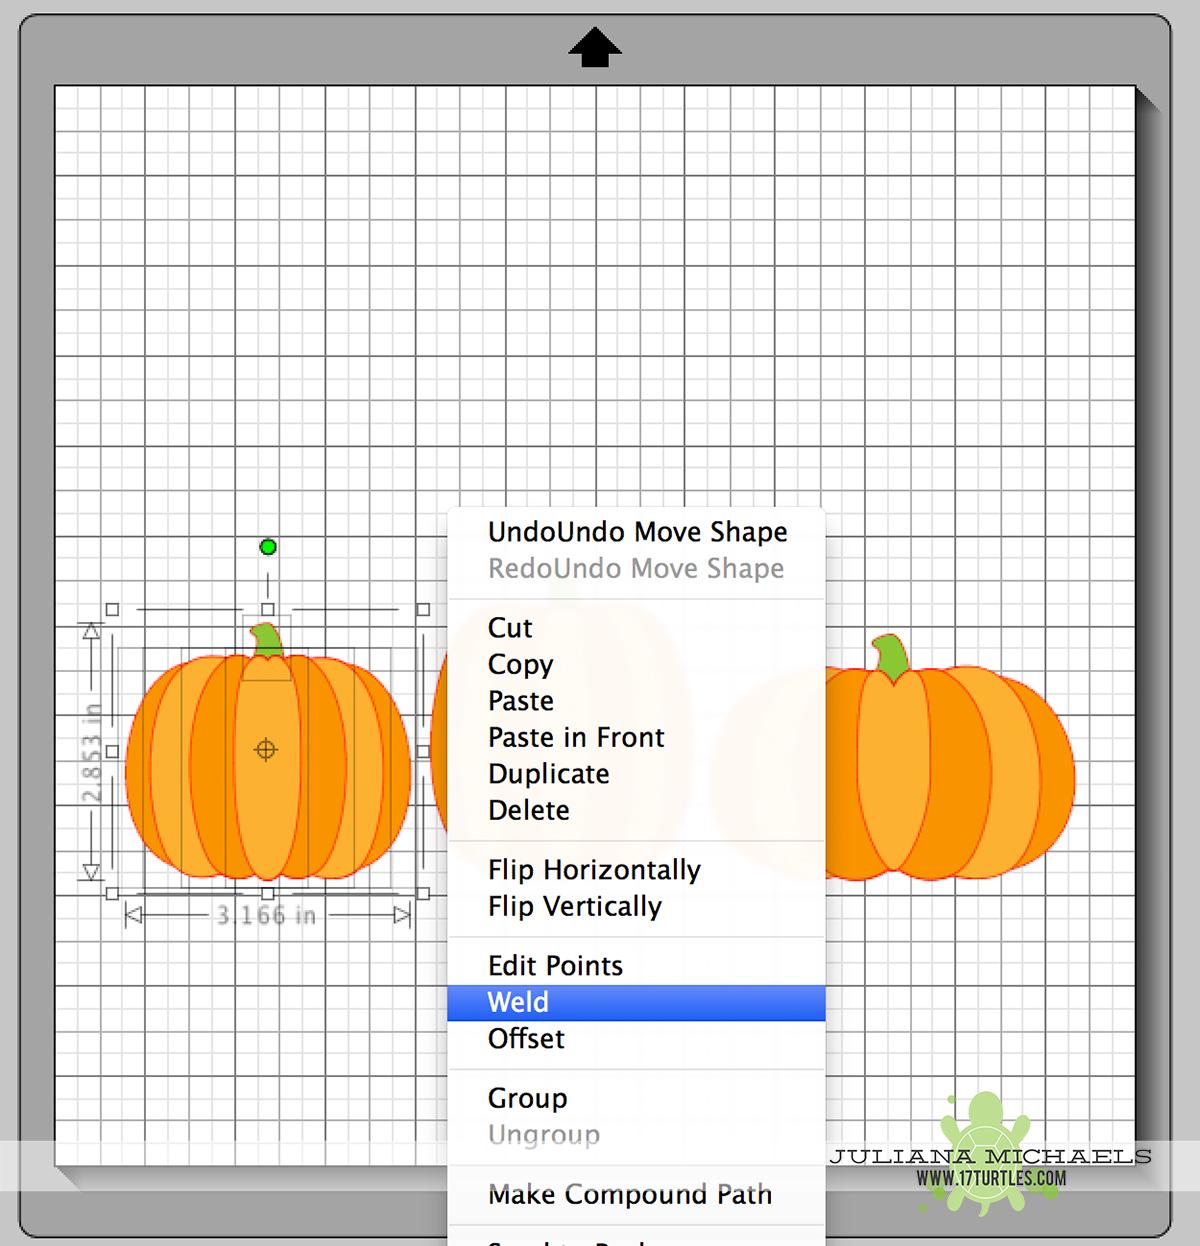 Welding Layered Digital Cut Files Tutorial by Juliana Michaels 17turtles